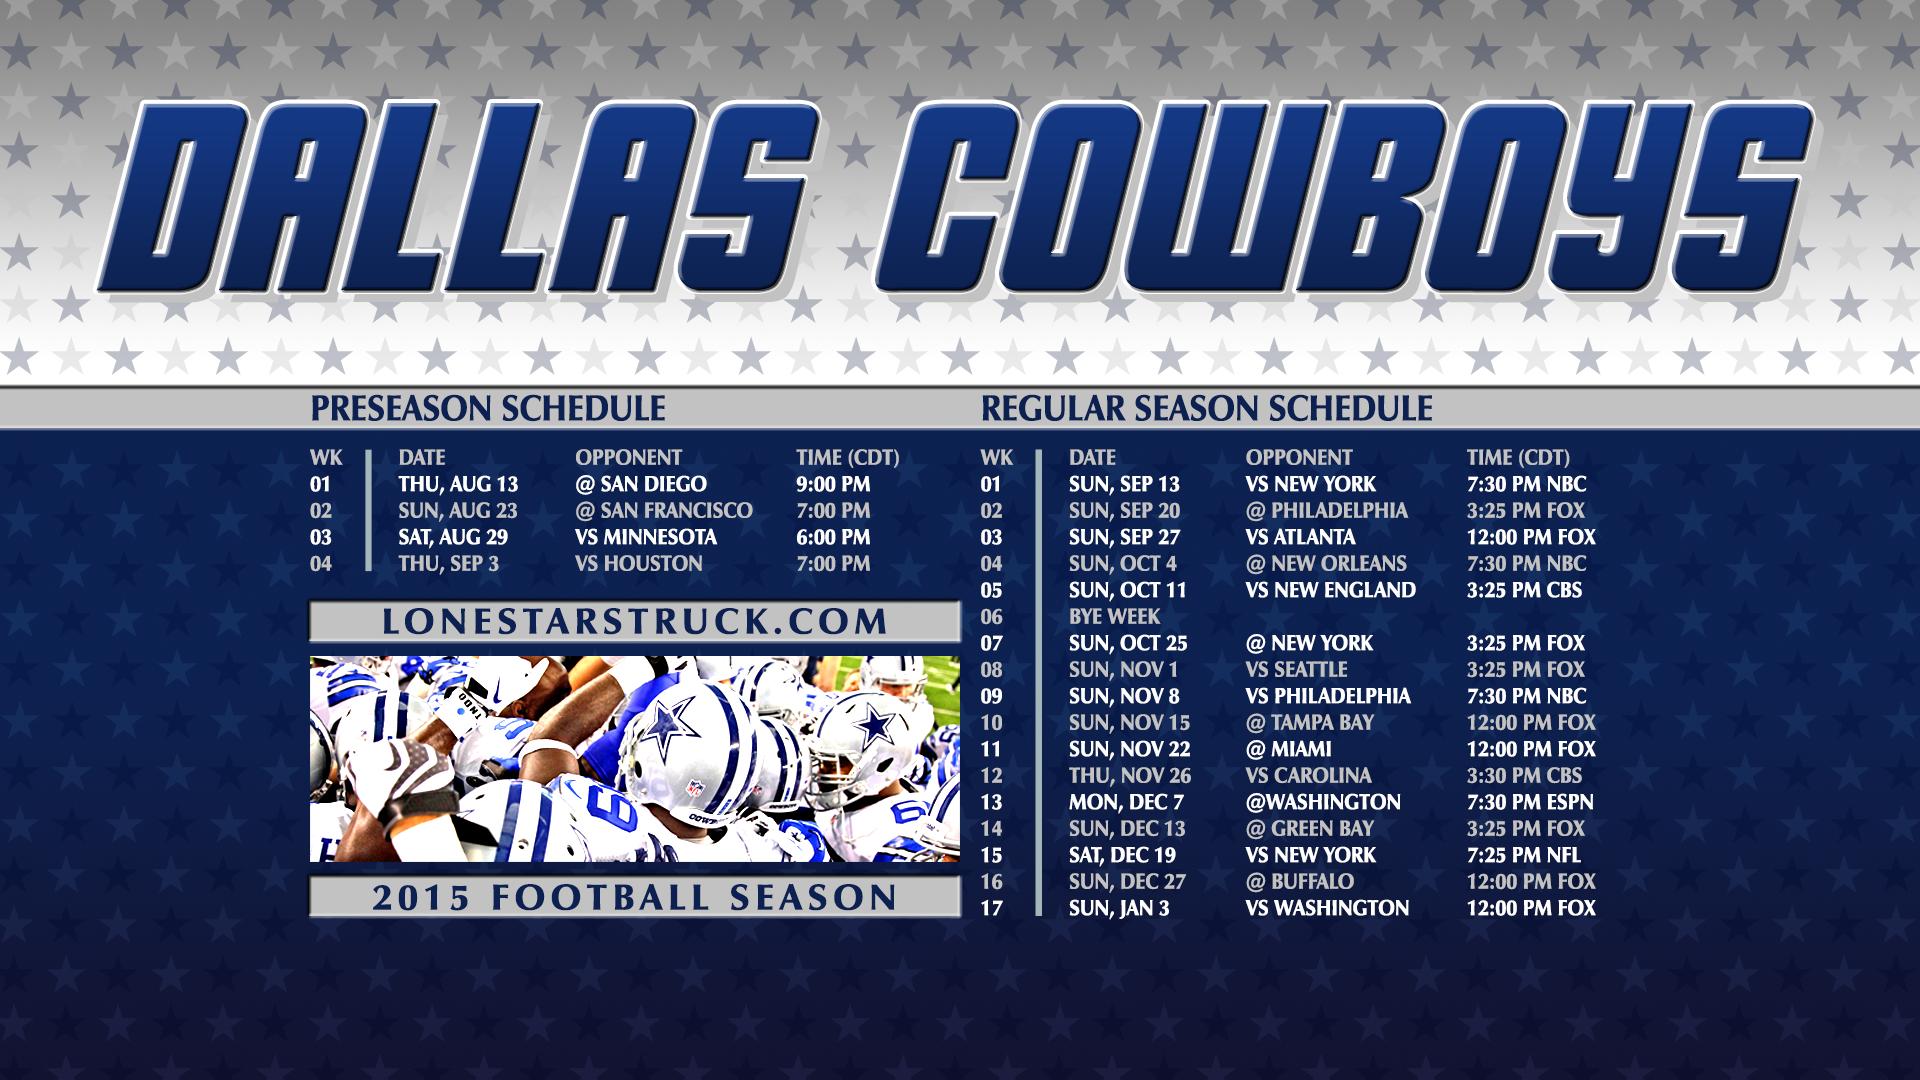 dbdd8ef4901 Dallas Cowboys Schedule 2015 Wallpaper - WallpaperSafari